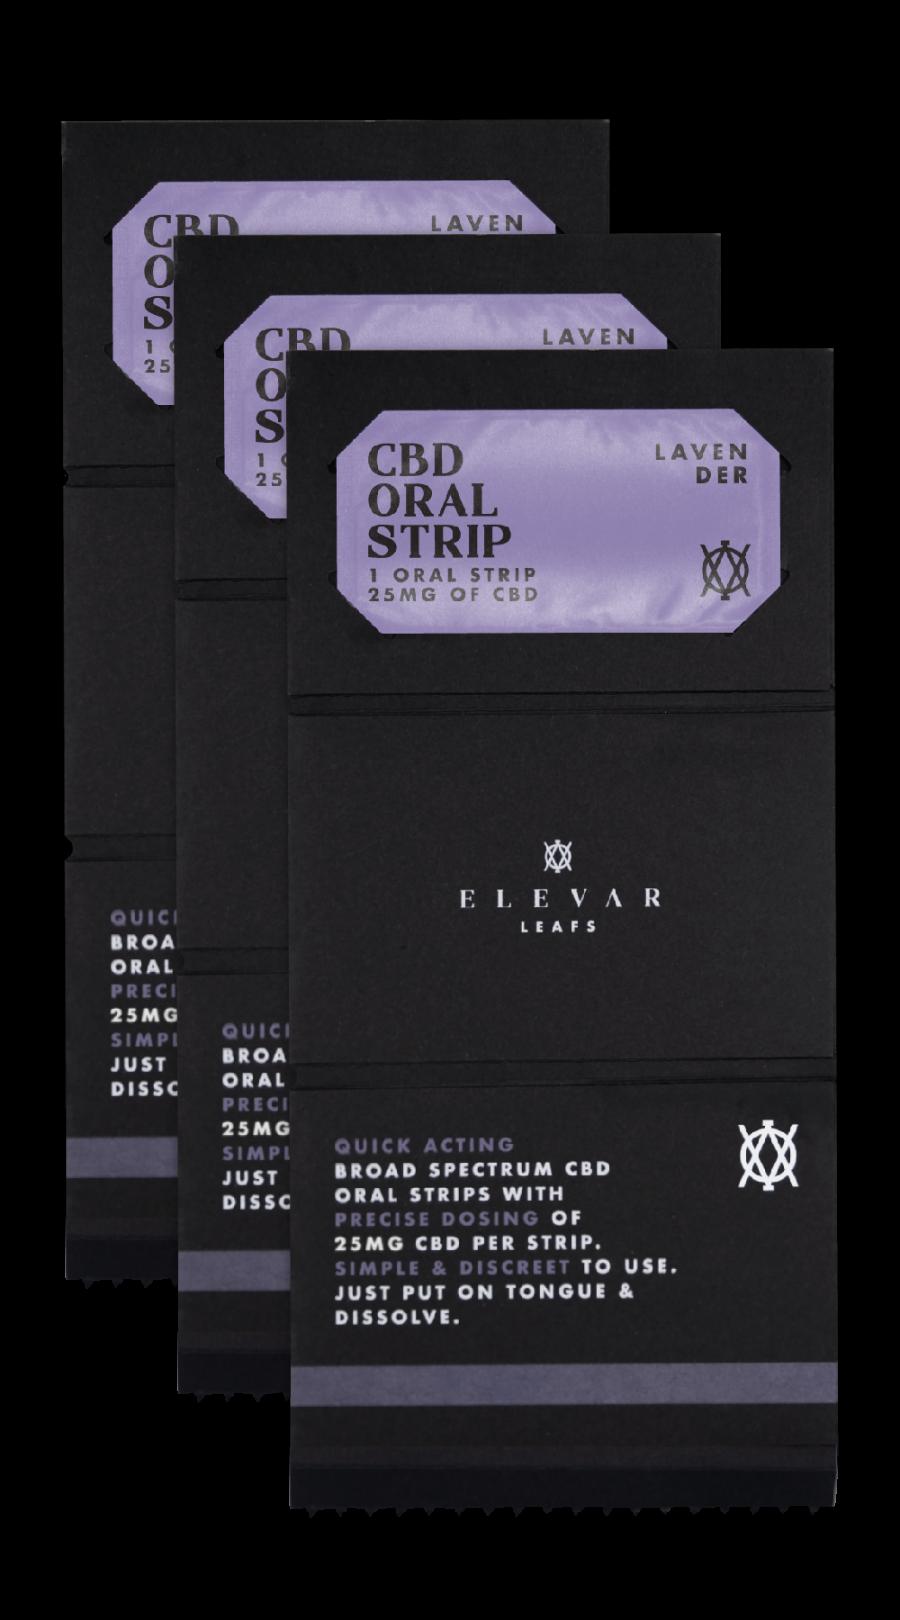 Elevar Hemp CBD Lavender CBD Oral strips 3 Pack Opened